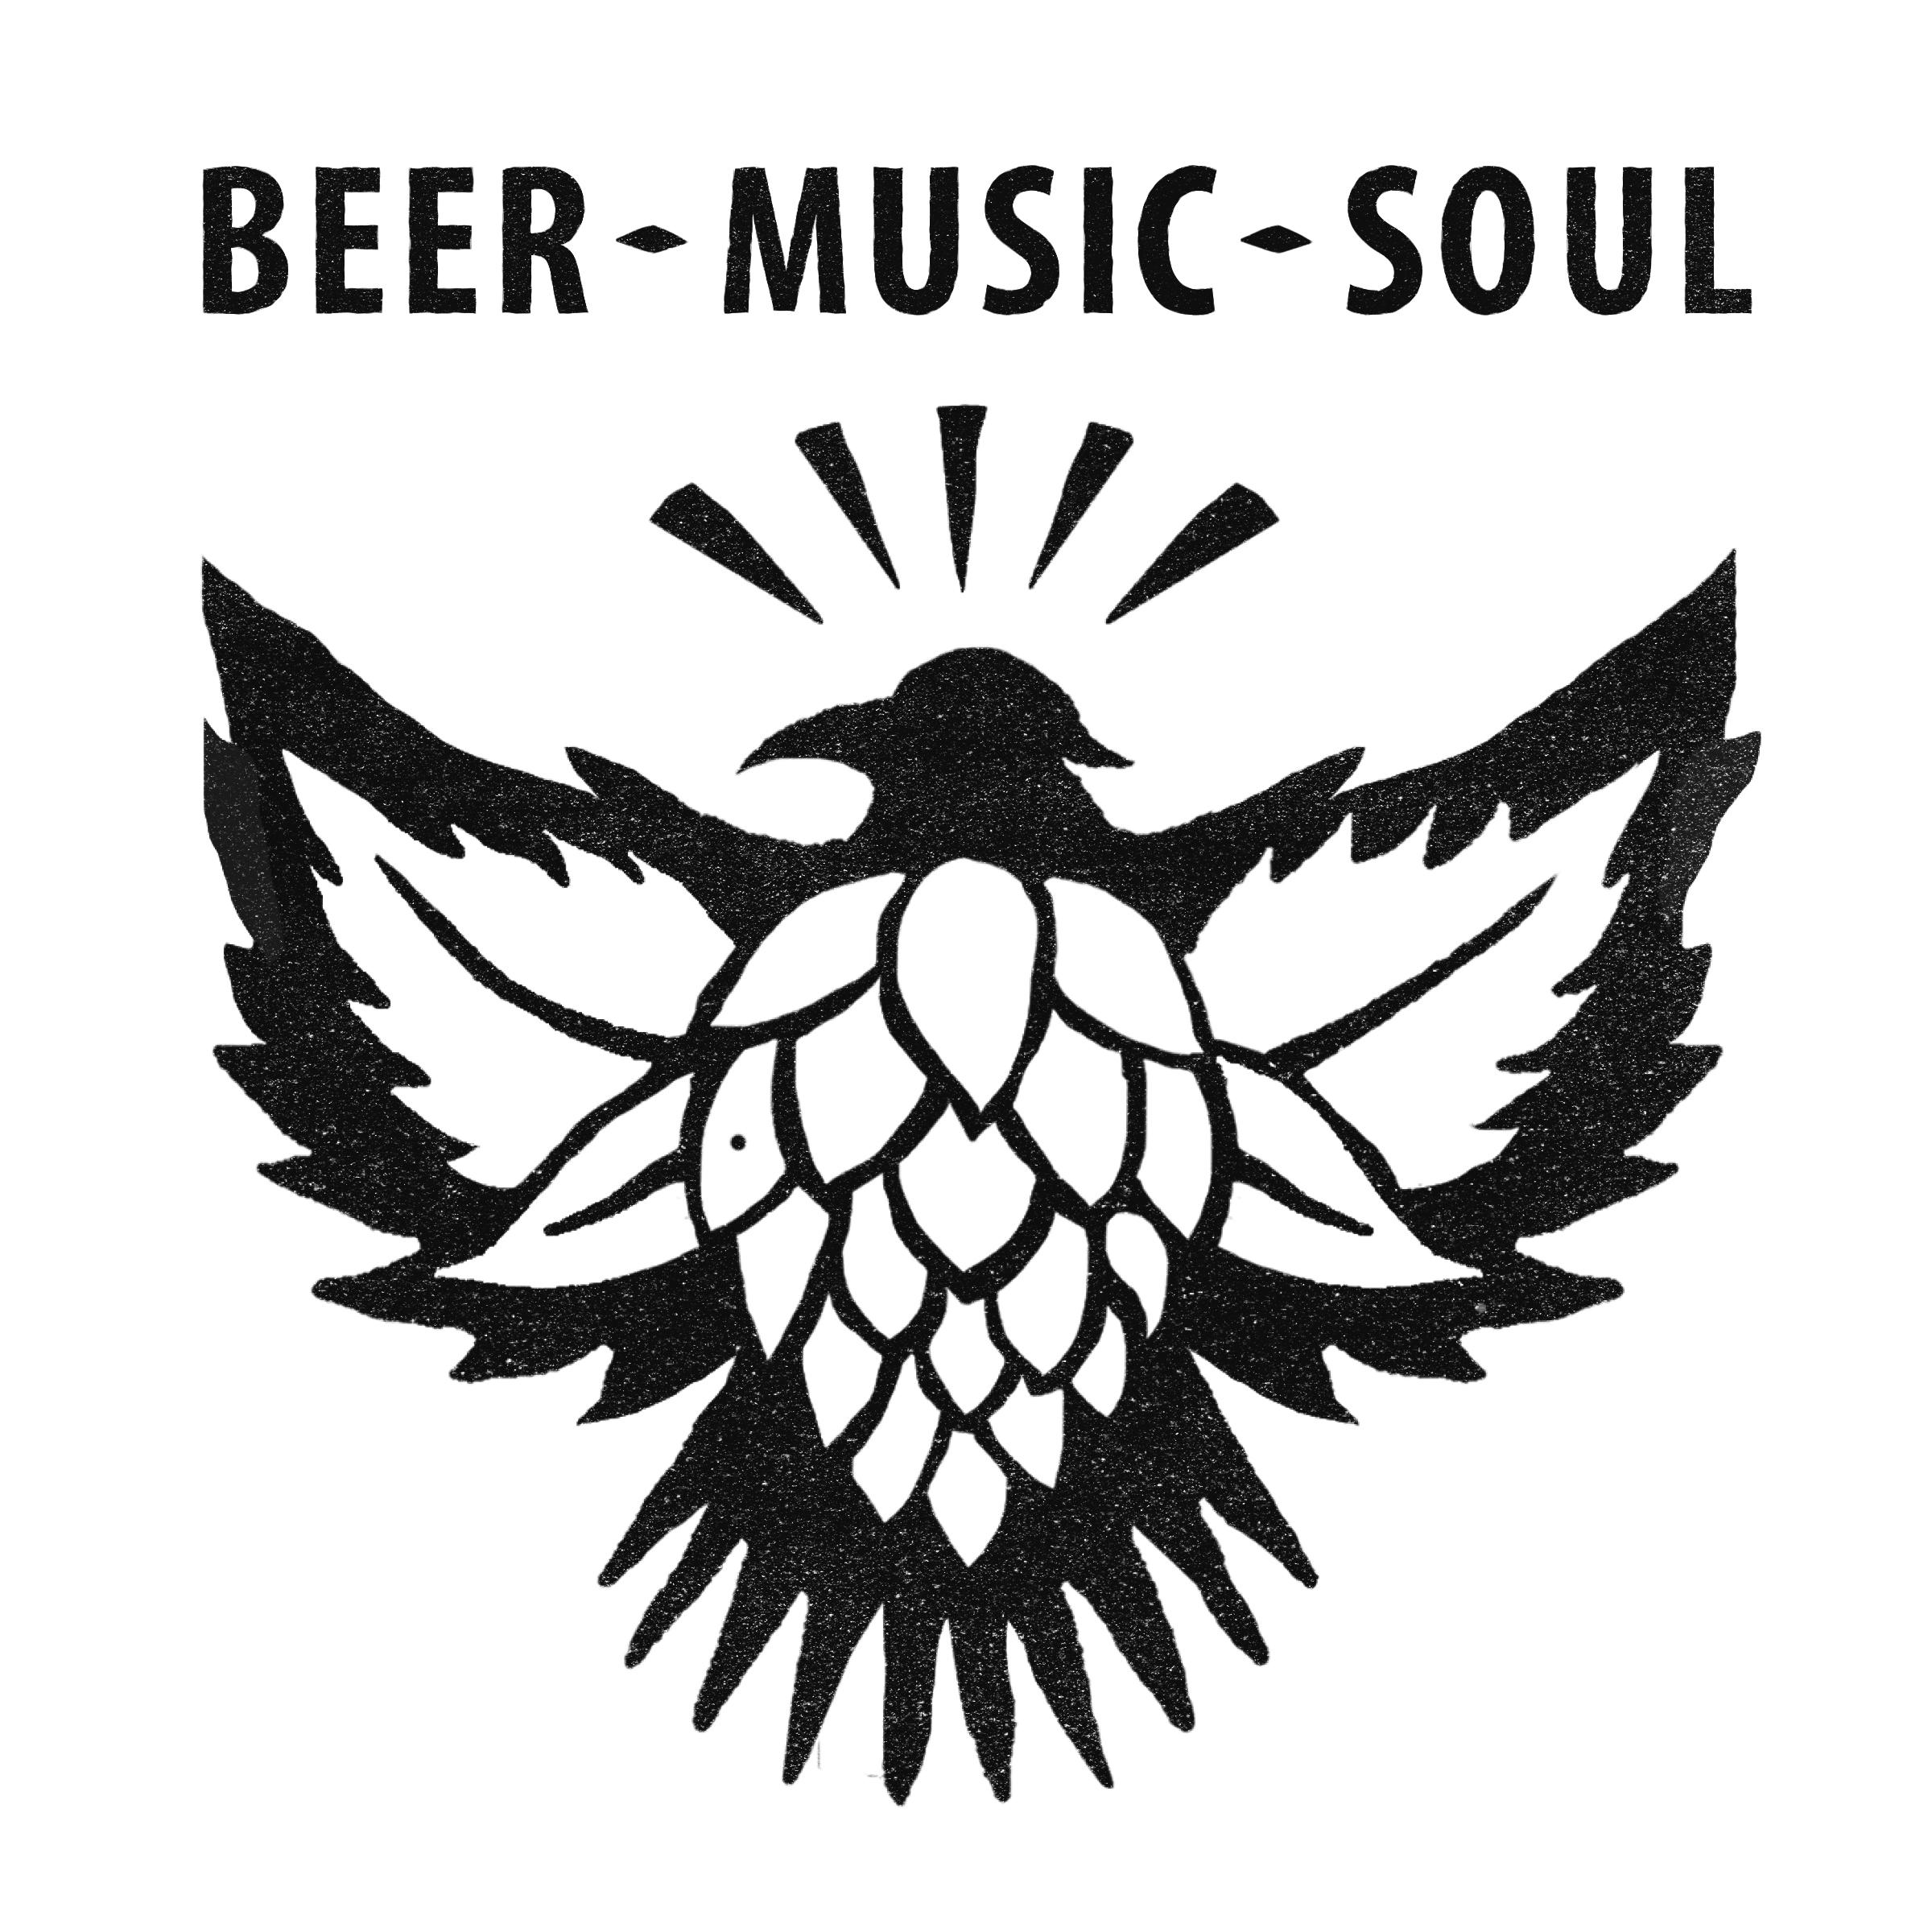 BeerMusicSoul.jpg